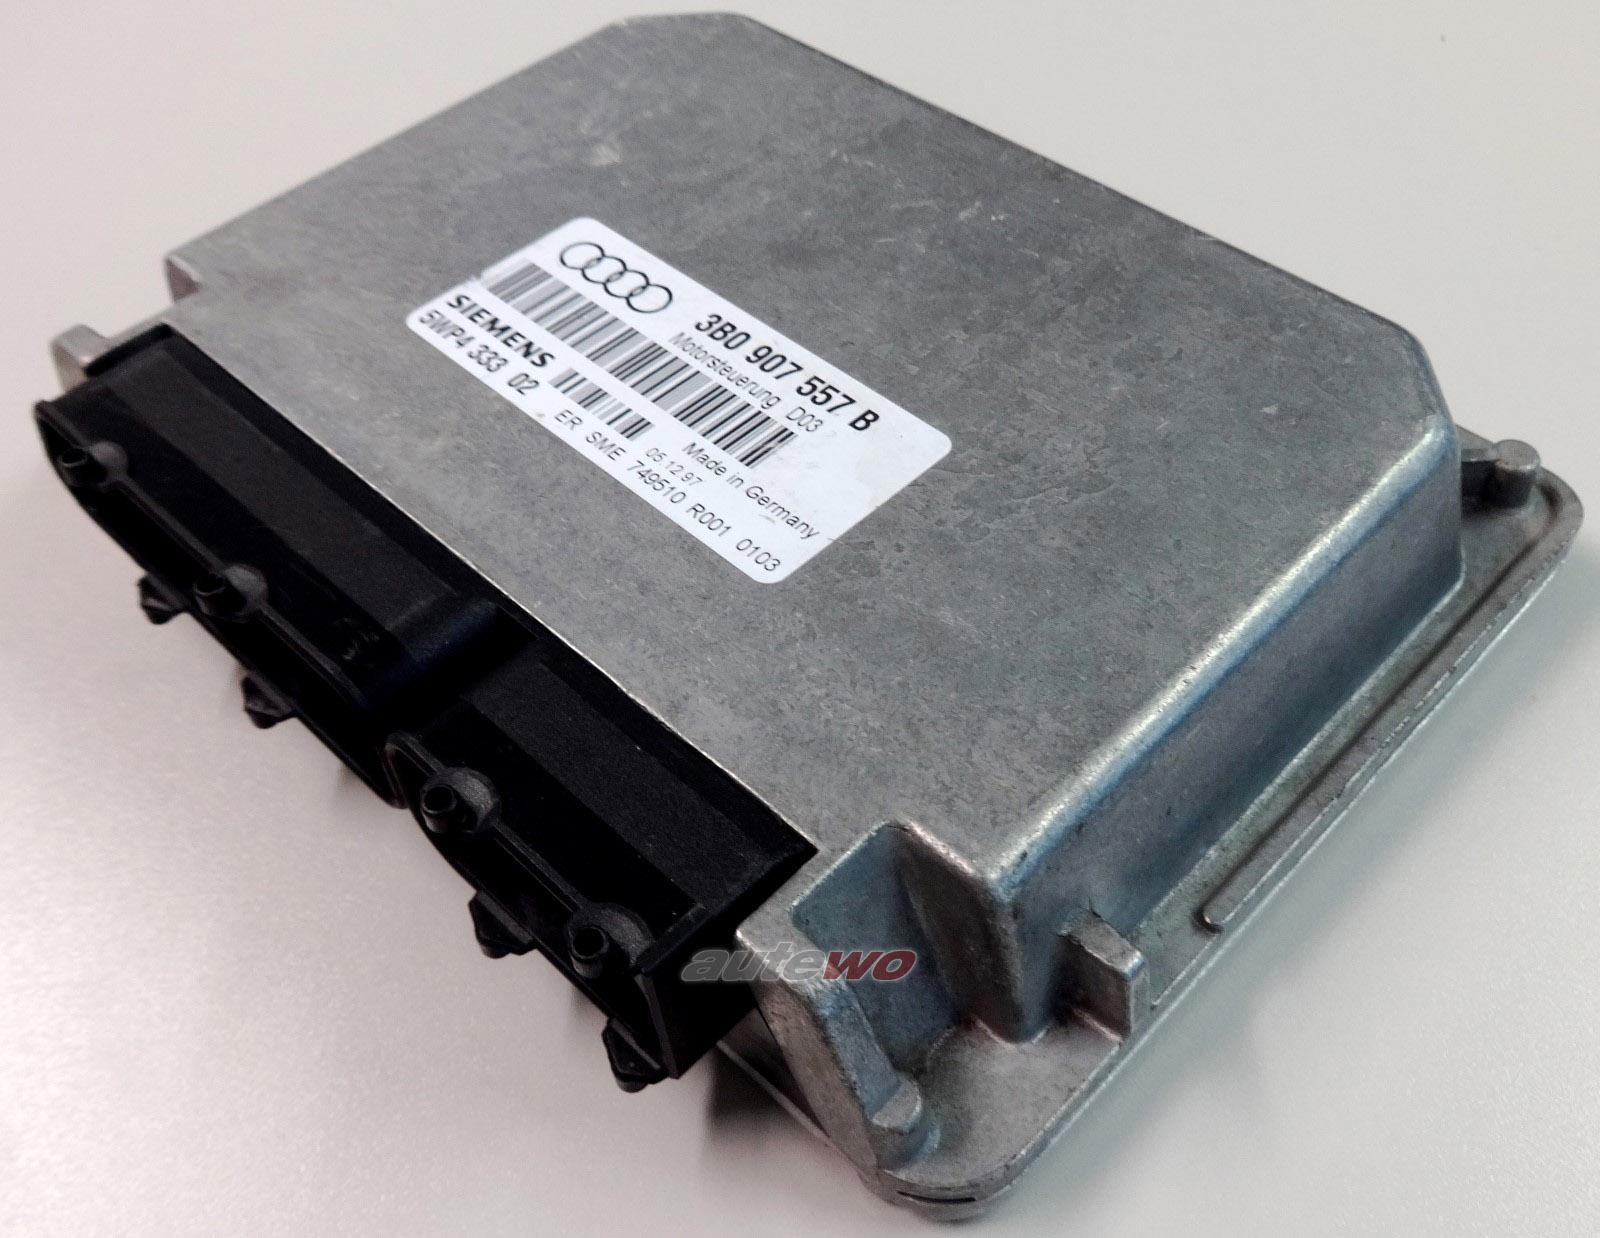 #3B0907557B 5WP433302 Audi A4 B5 1.6l 100PS 4 Zyl. AHL Motorsteuergerät